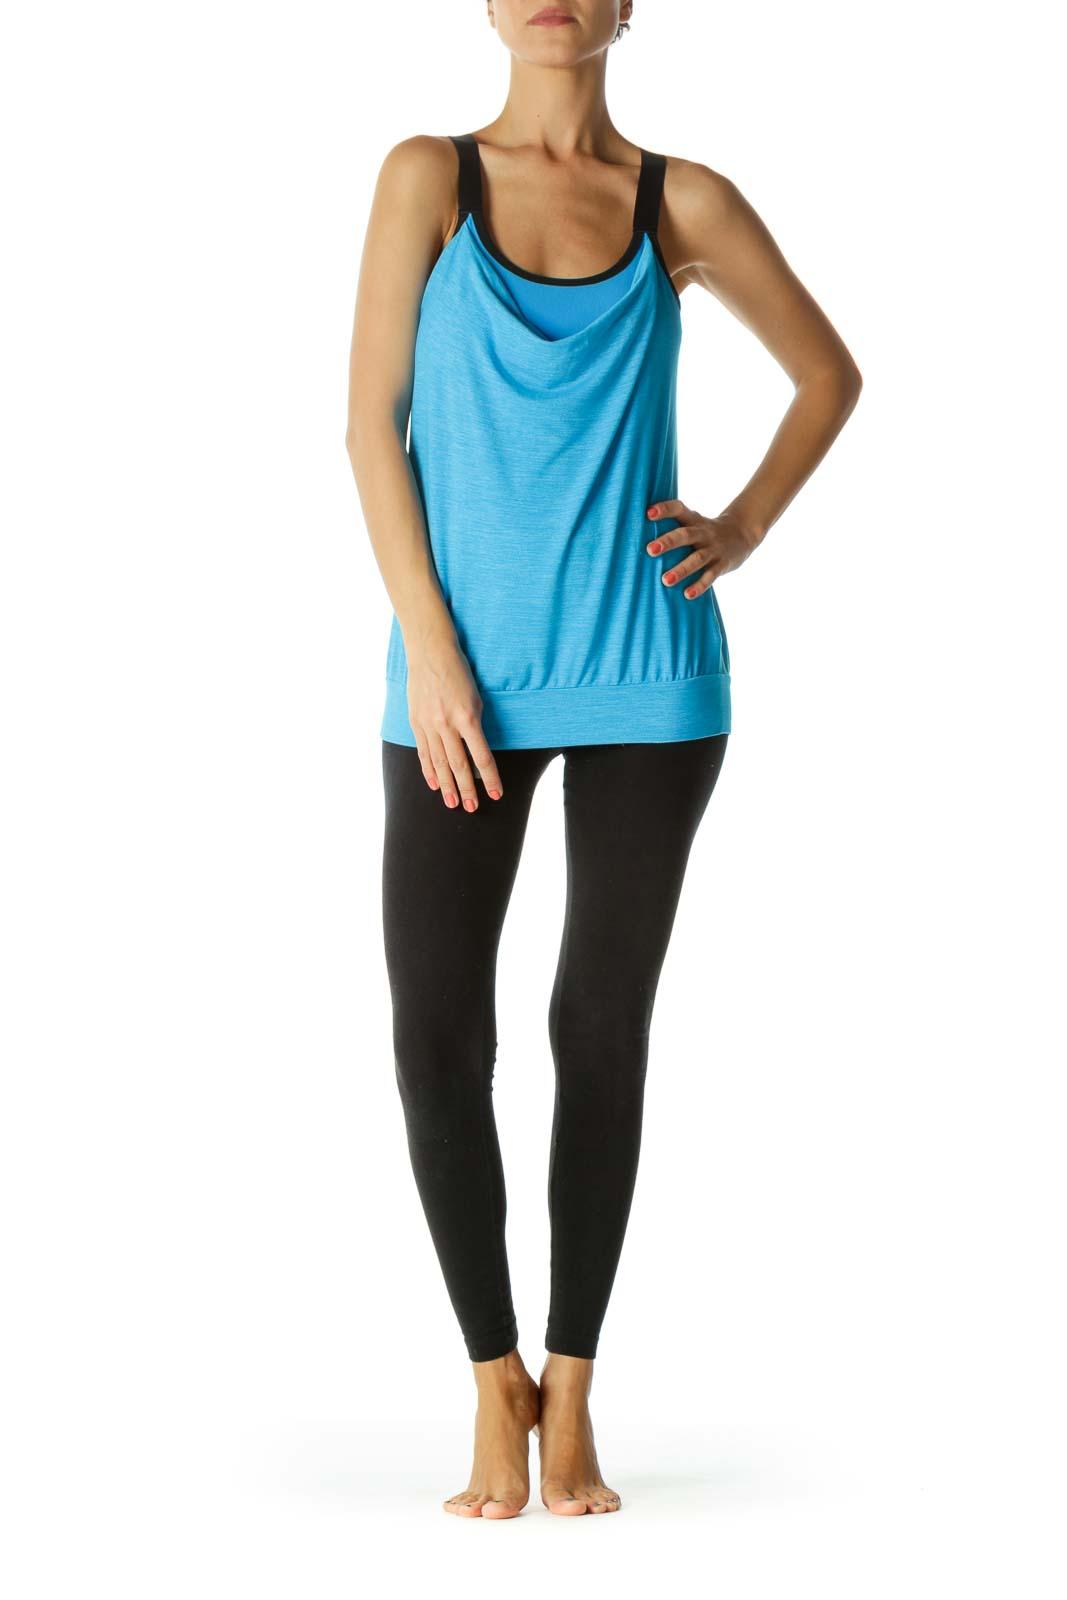 Blue Black Mottled Print Elastic Thick-Straps Crisscross Back Yoga Top